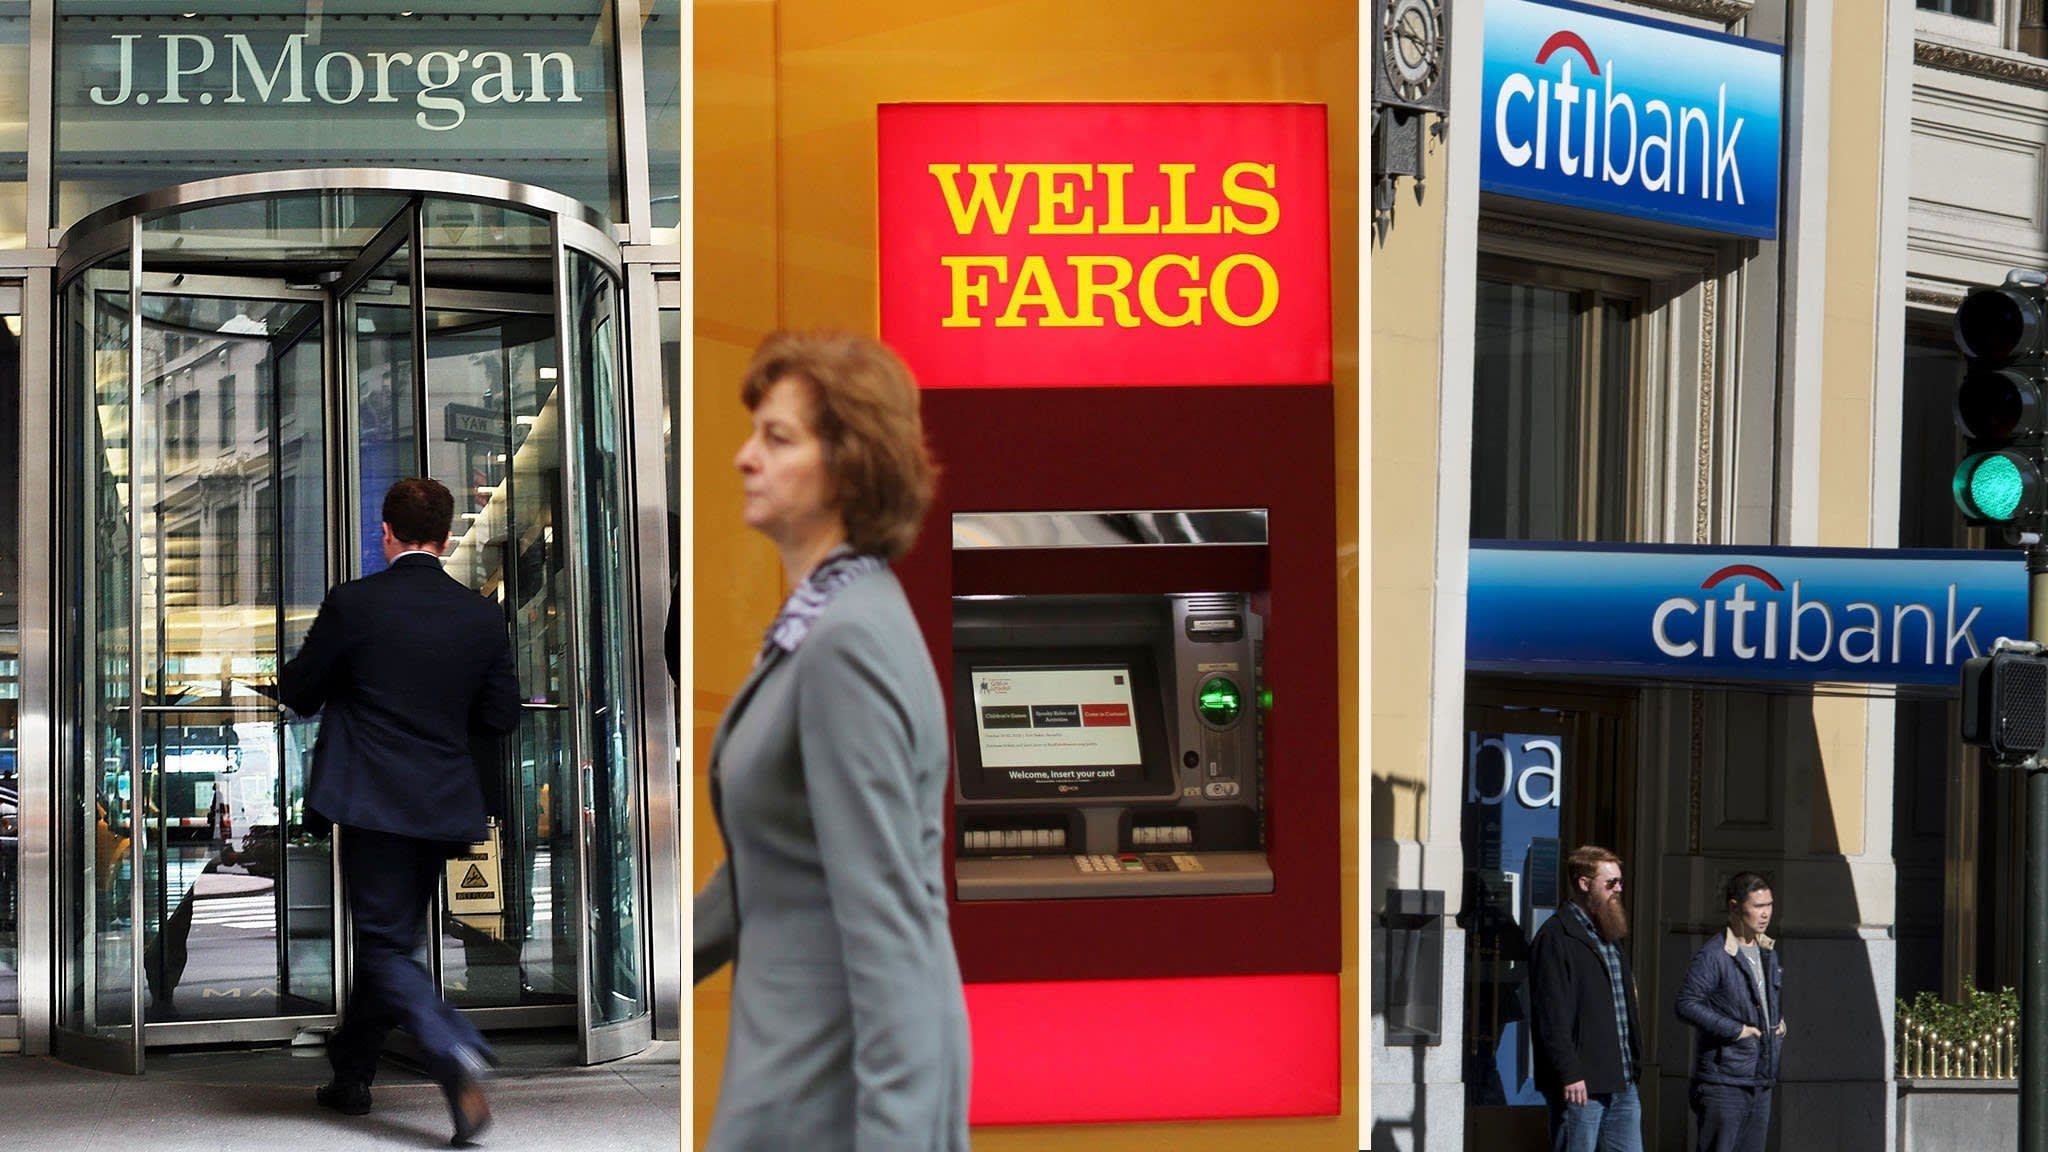 JPMorgan and Citi fail to impress investors despite strong earnings